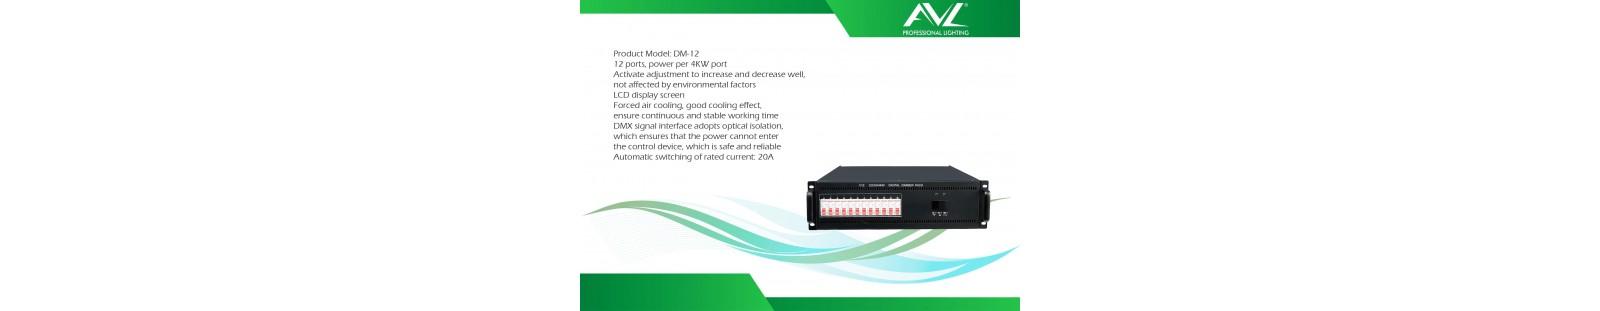 AVL DM 12